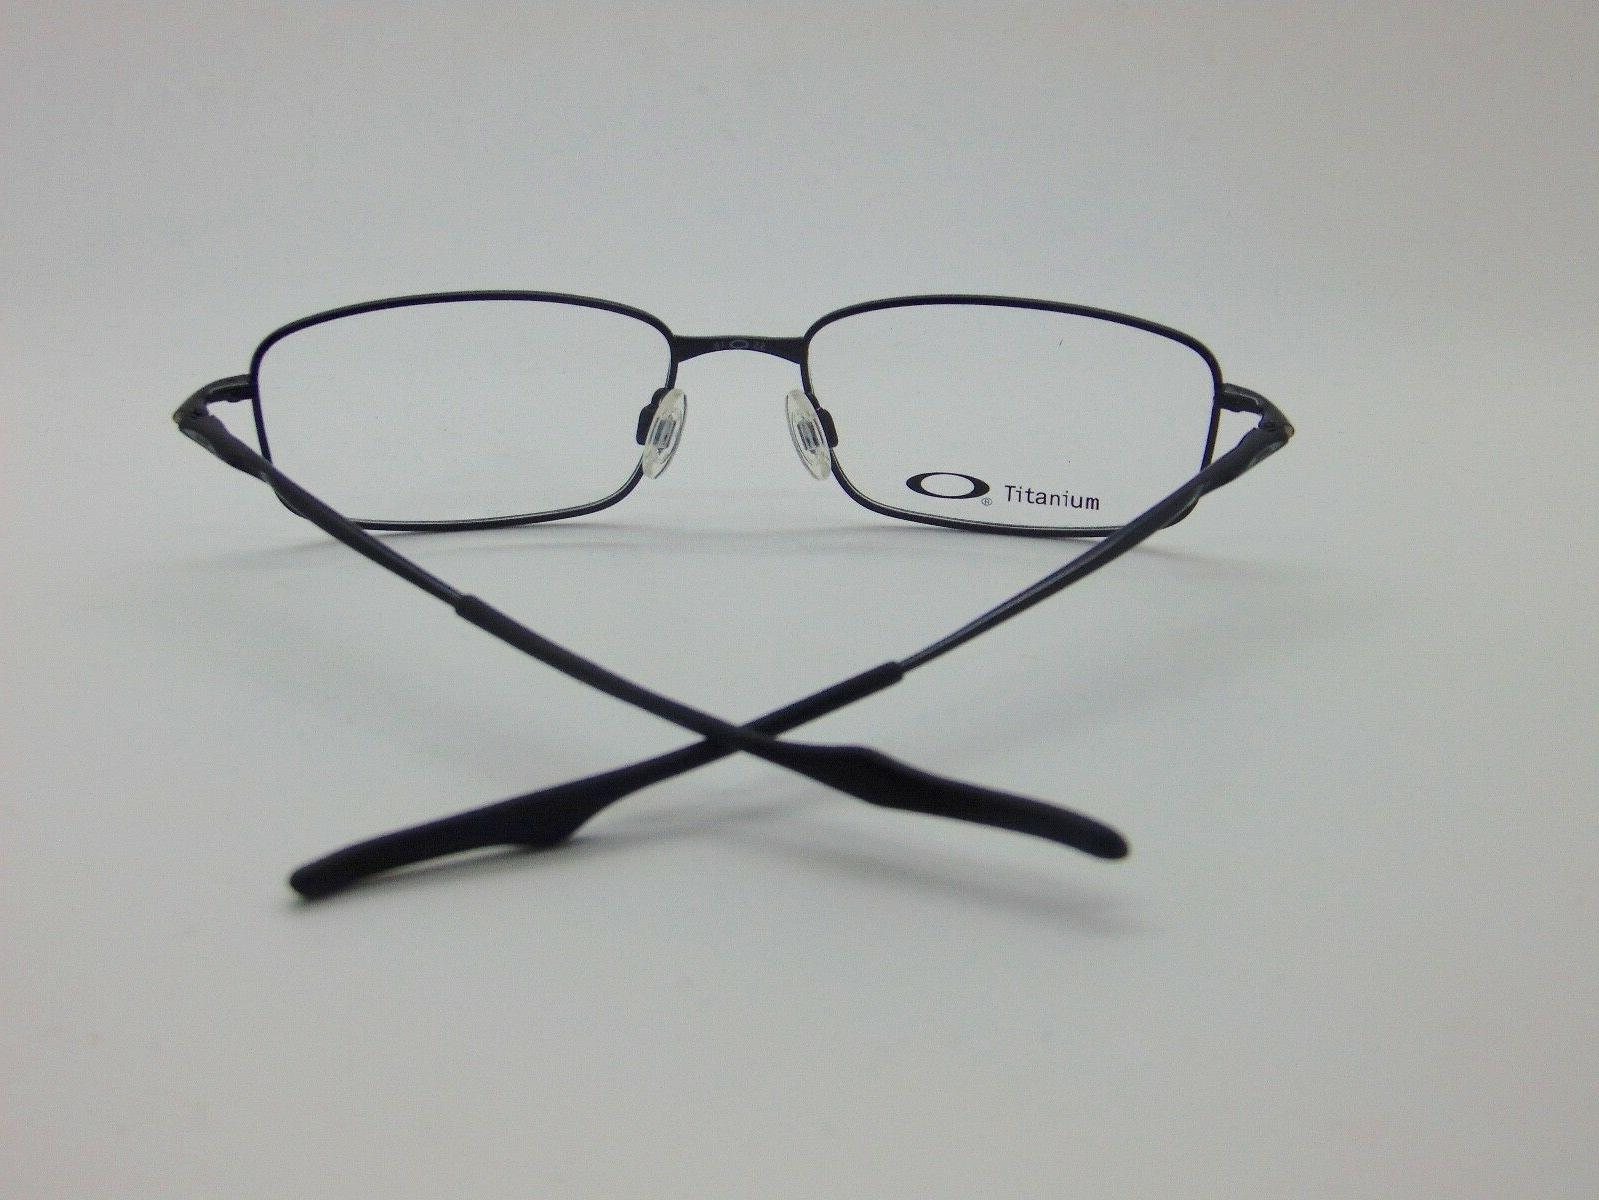 New BLADE OX3125-0155 Polished Black 55mm Rx